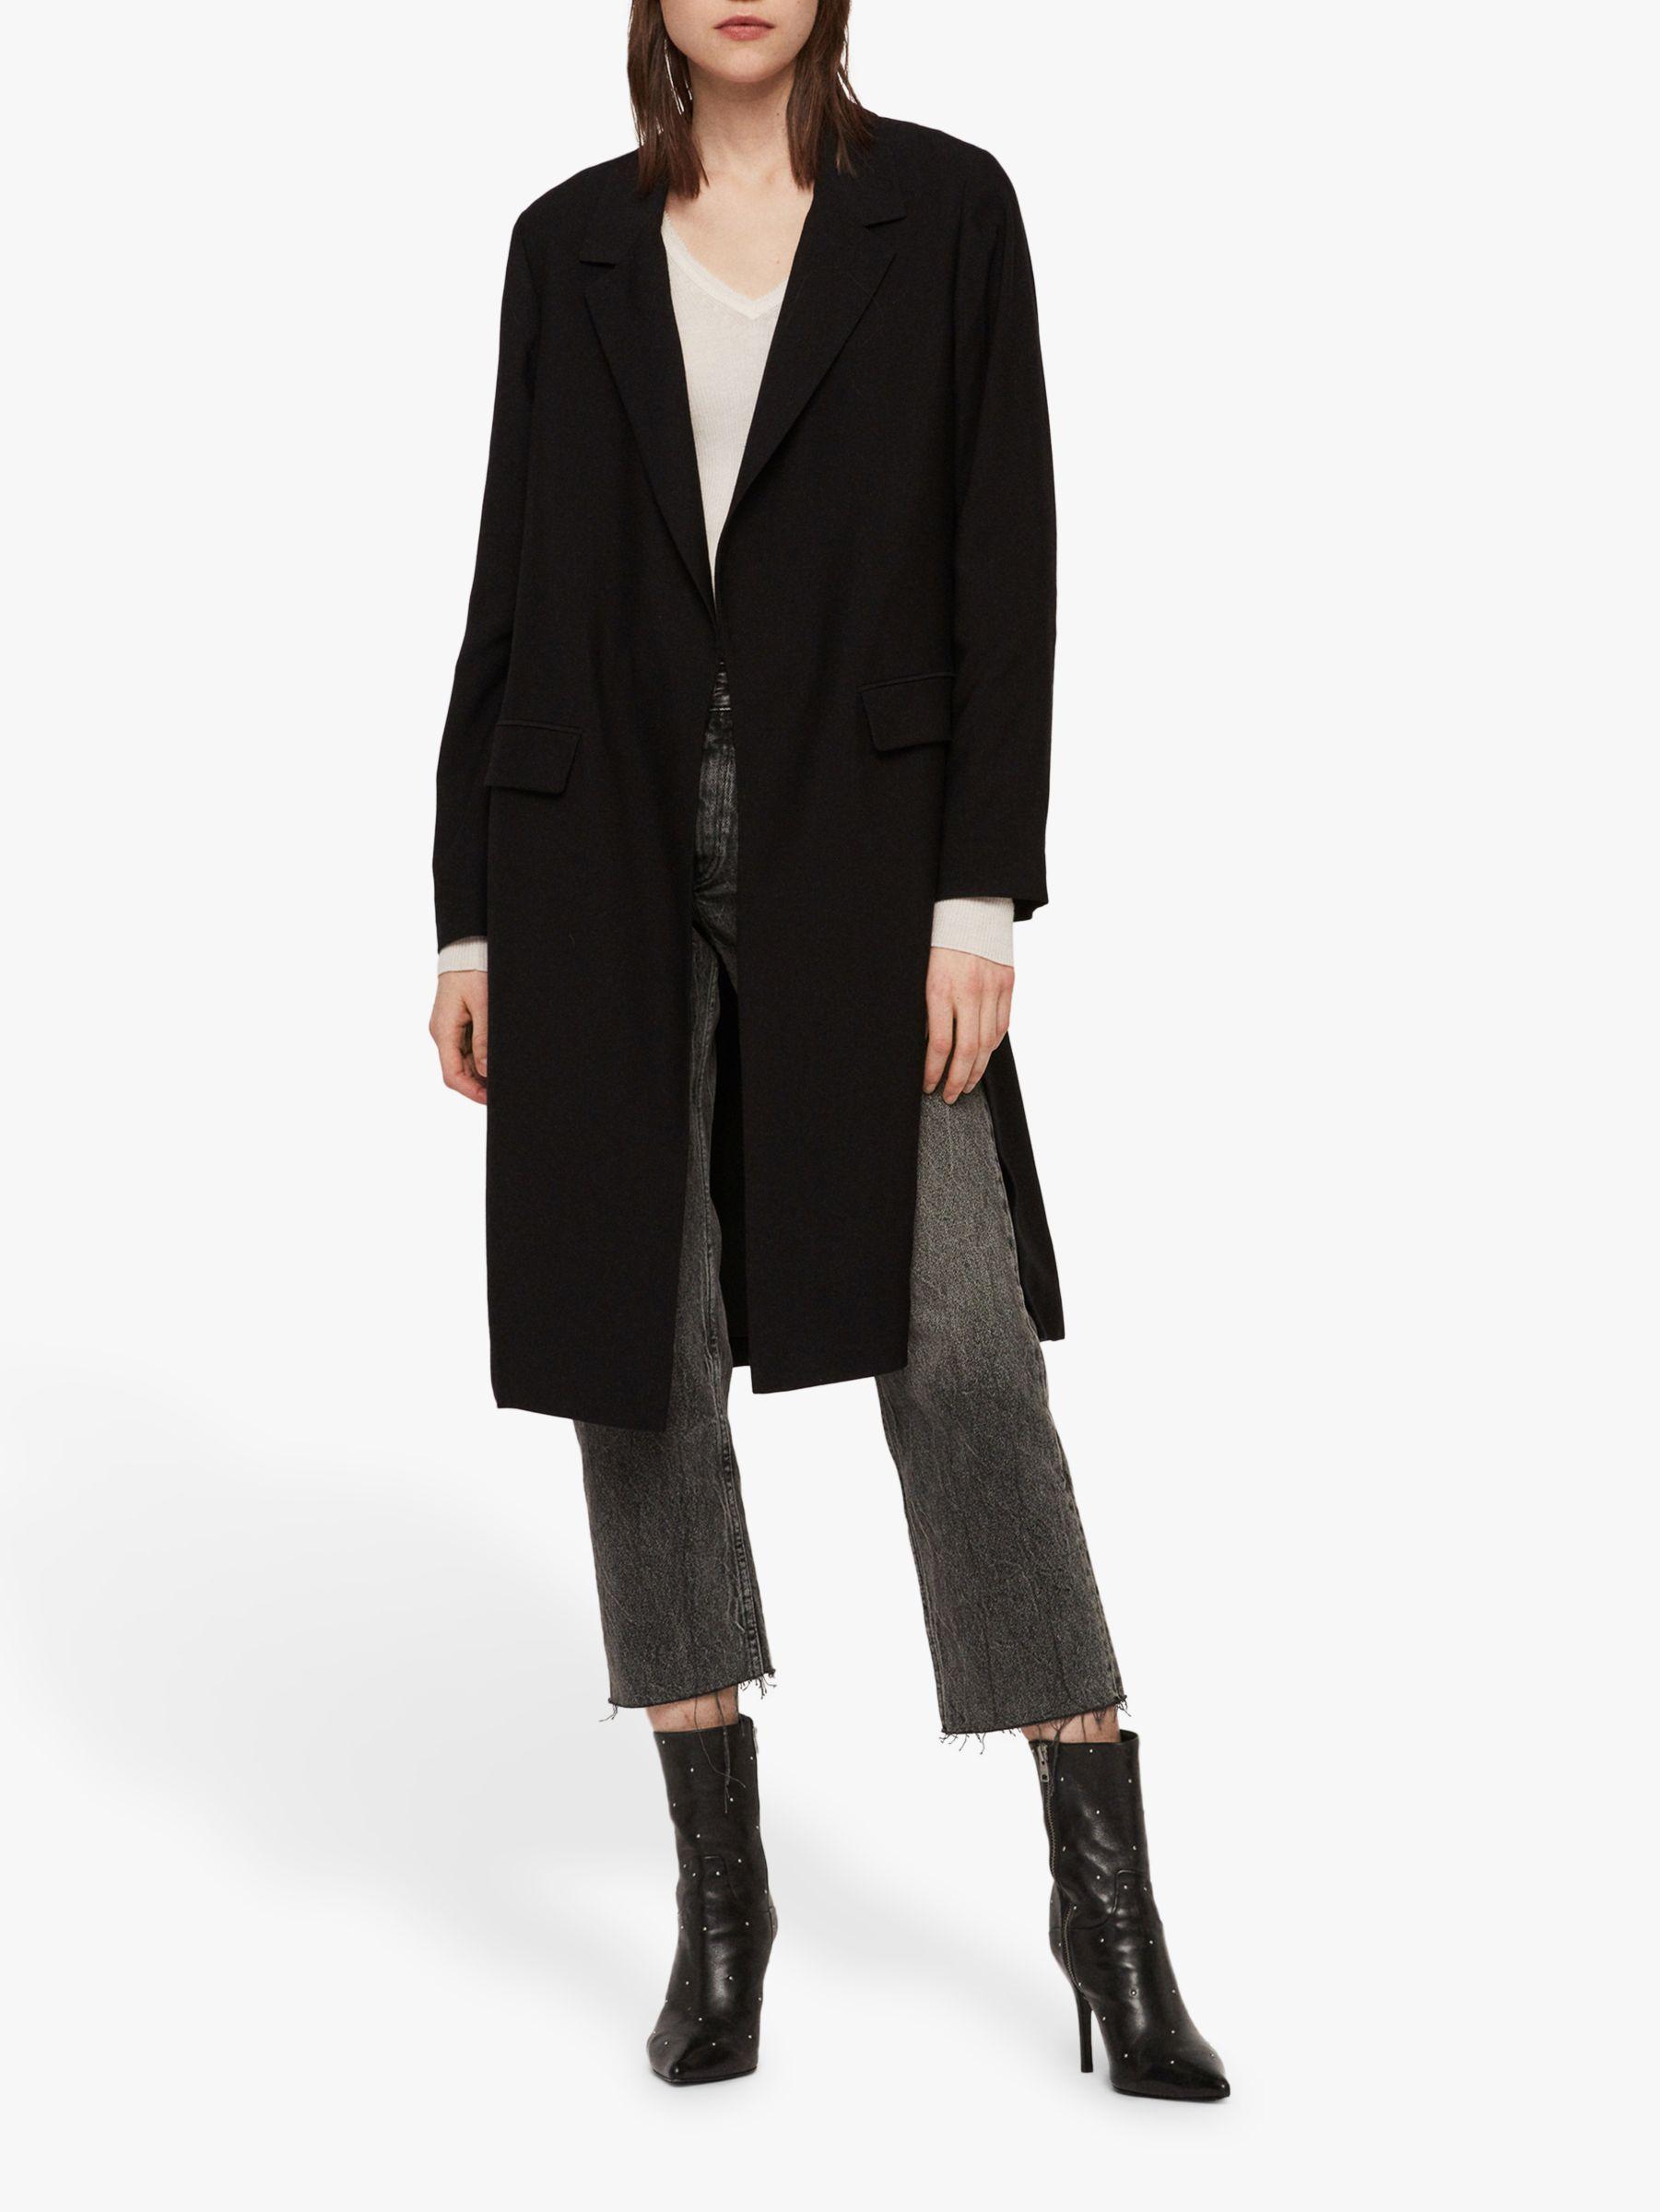 AllSaints AllSaints Aleida Duster Coat, Black